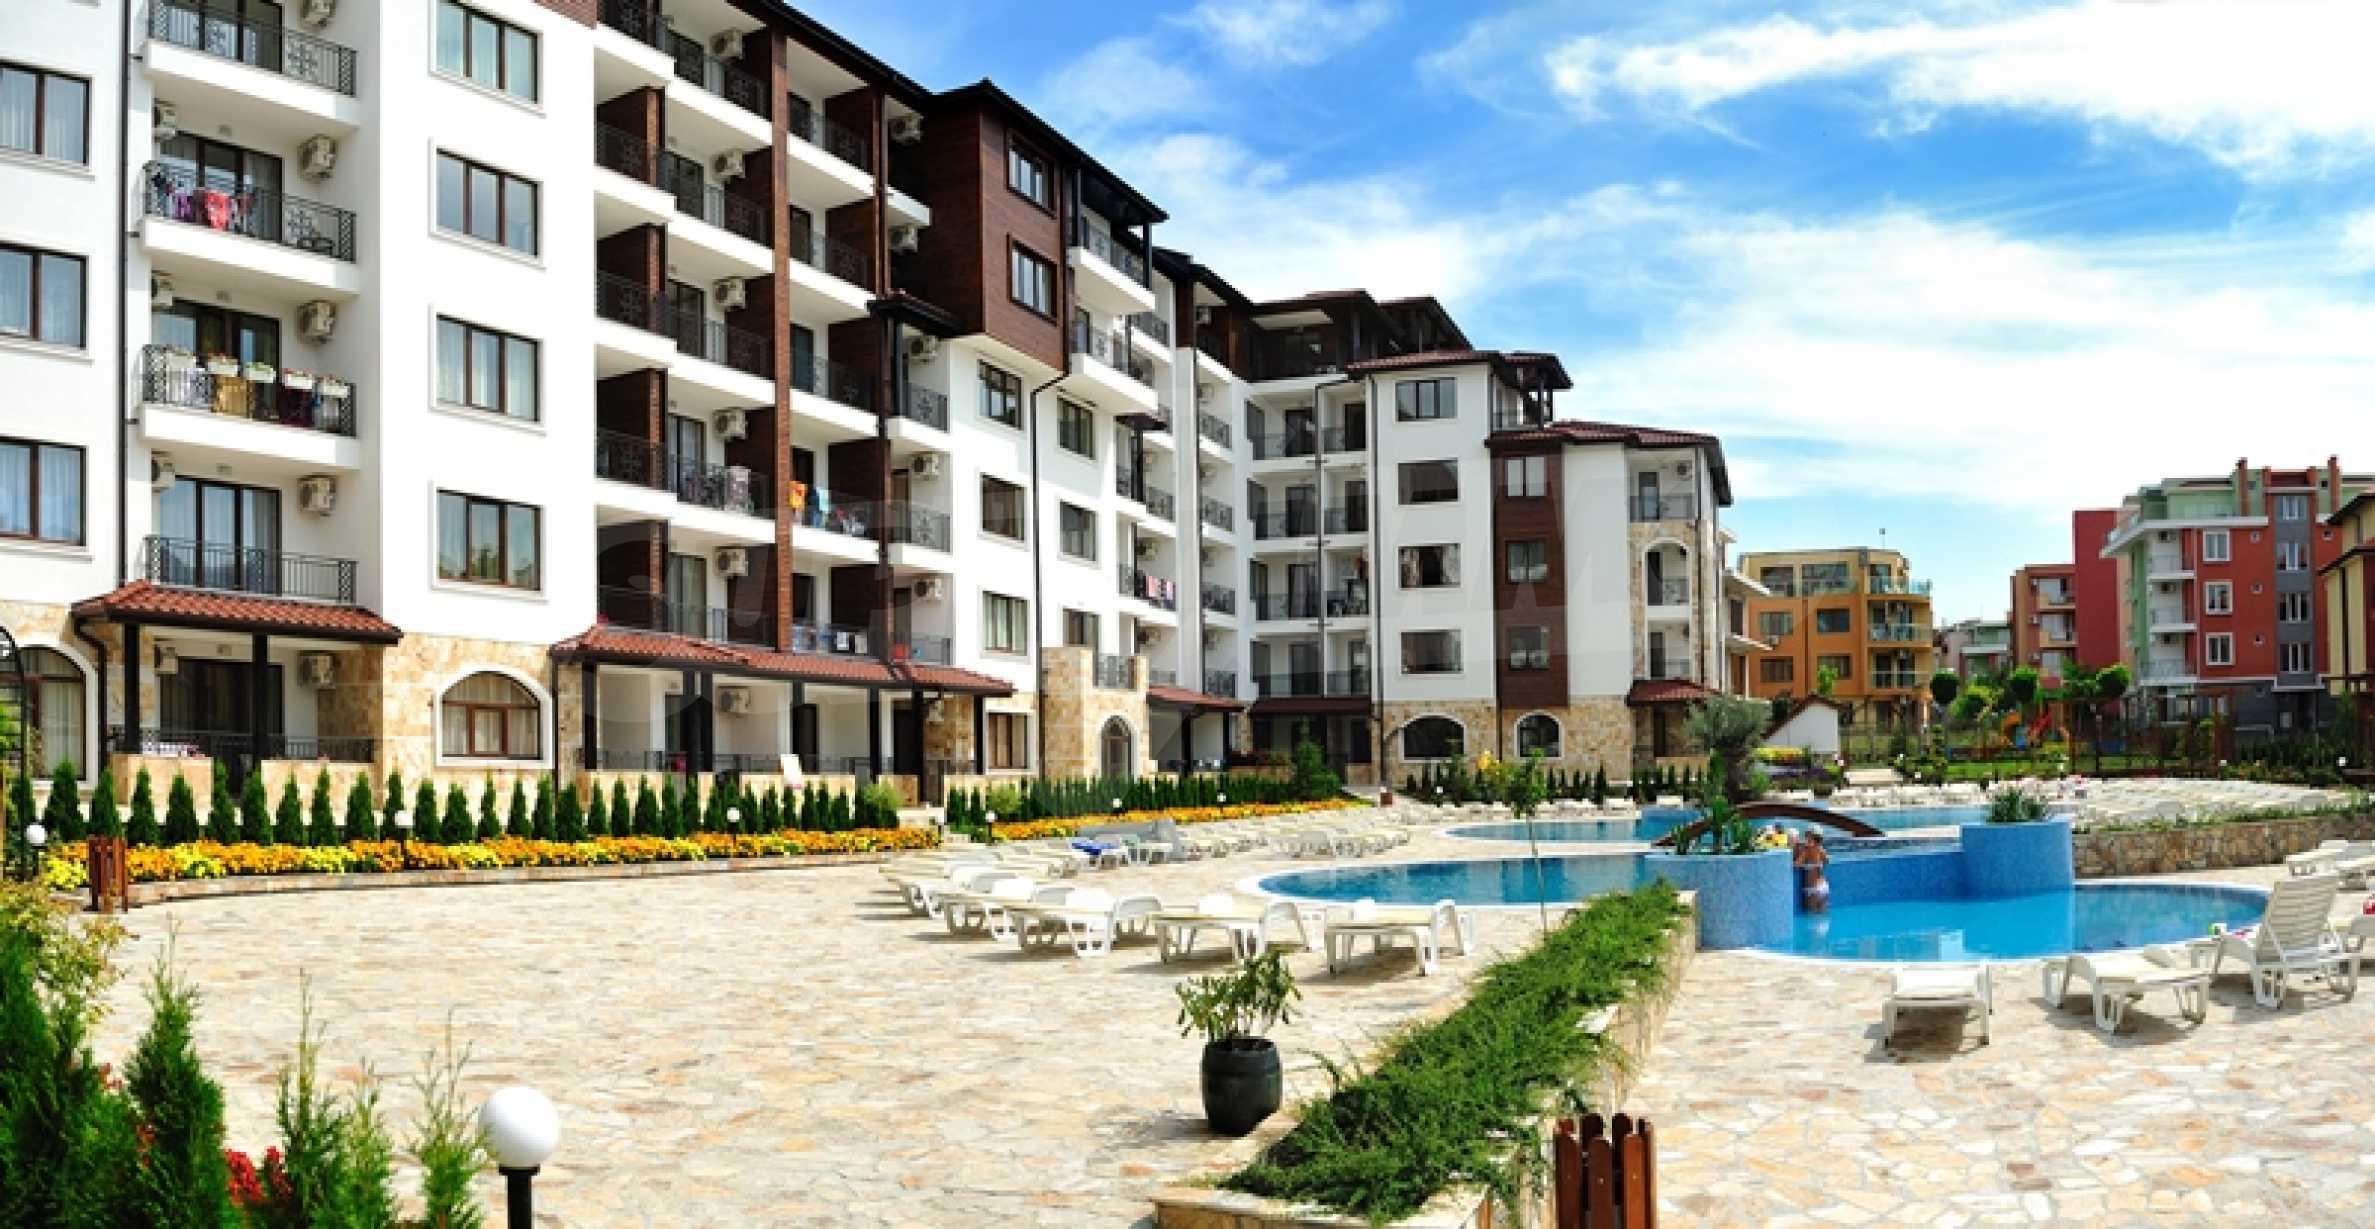 Апартаменти в готов комплекс до плажа на Равда, близо до гр. Несебър